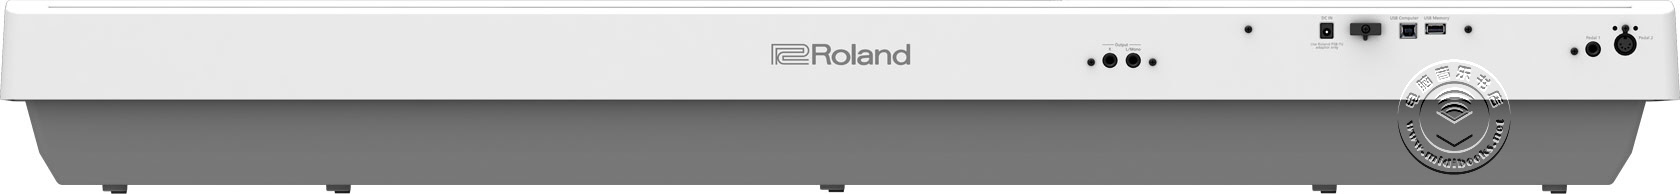 Roland(罗兰)发布FP-X系列便携式数码钢琴